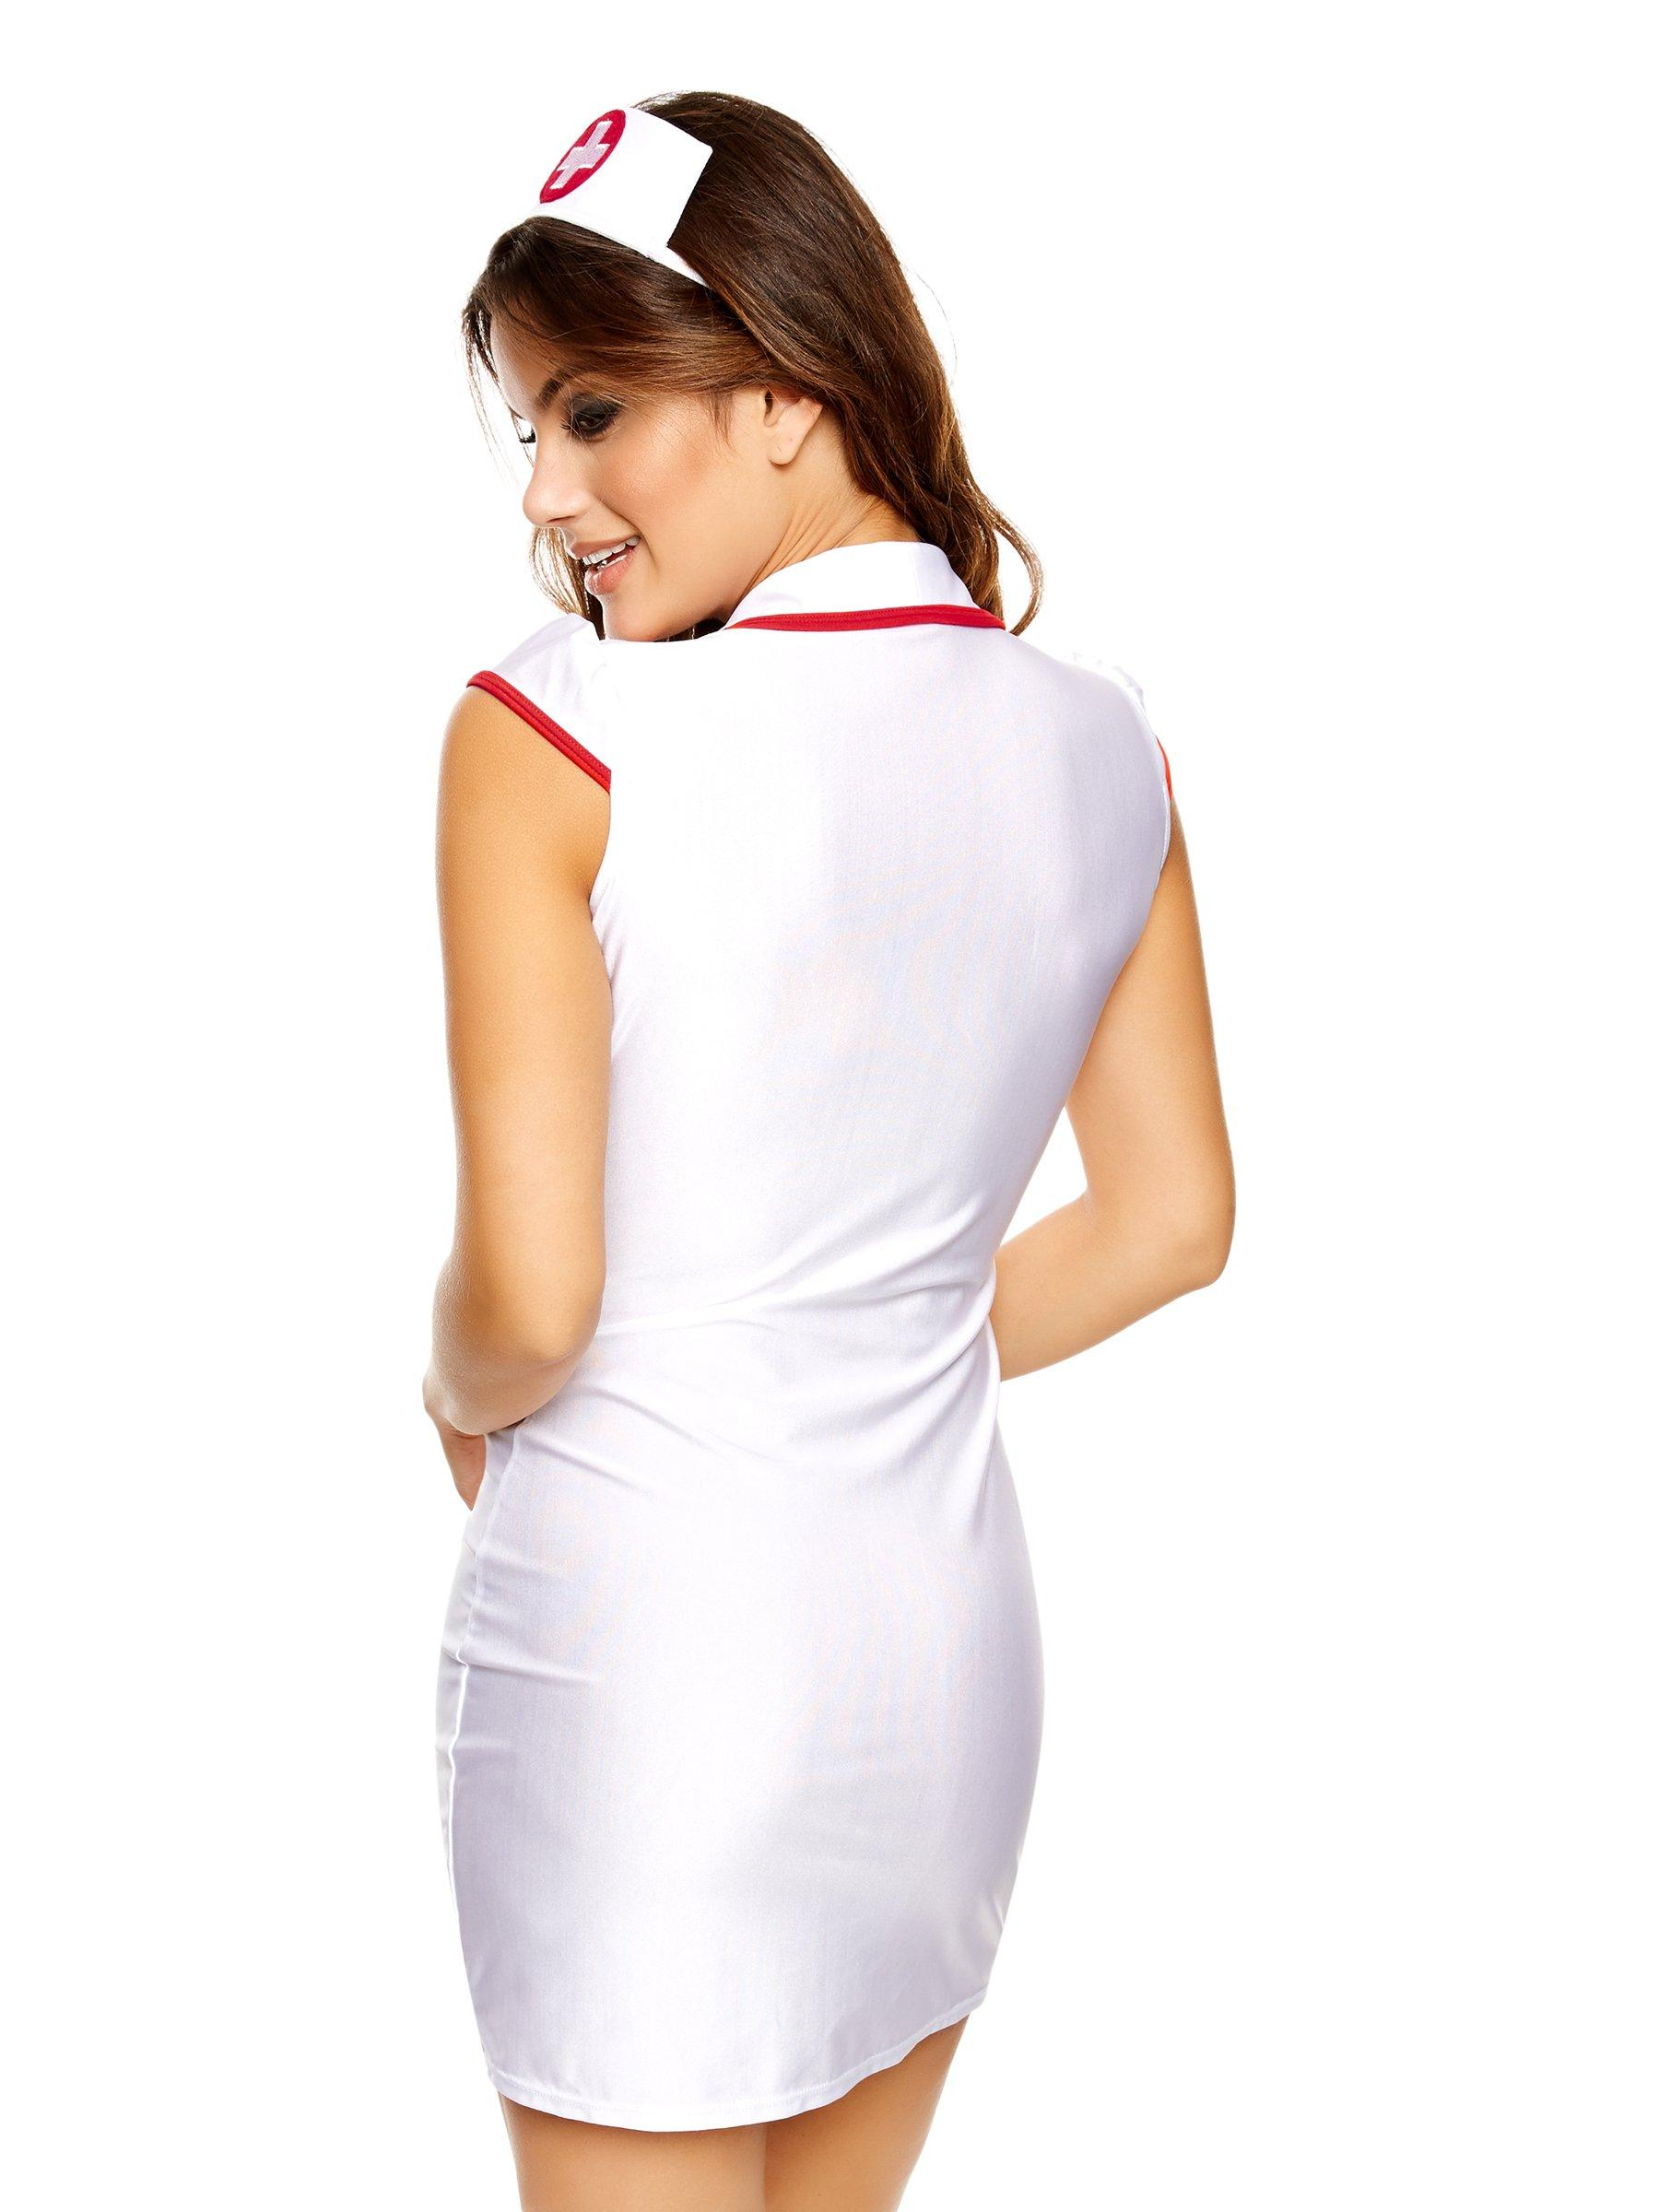 b7c78cb3e14 Details about Ann Summers Womens Ladies Hospital Hottie Nurse Outfit Sexy  Costume Fancy Dress